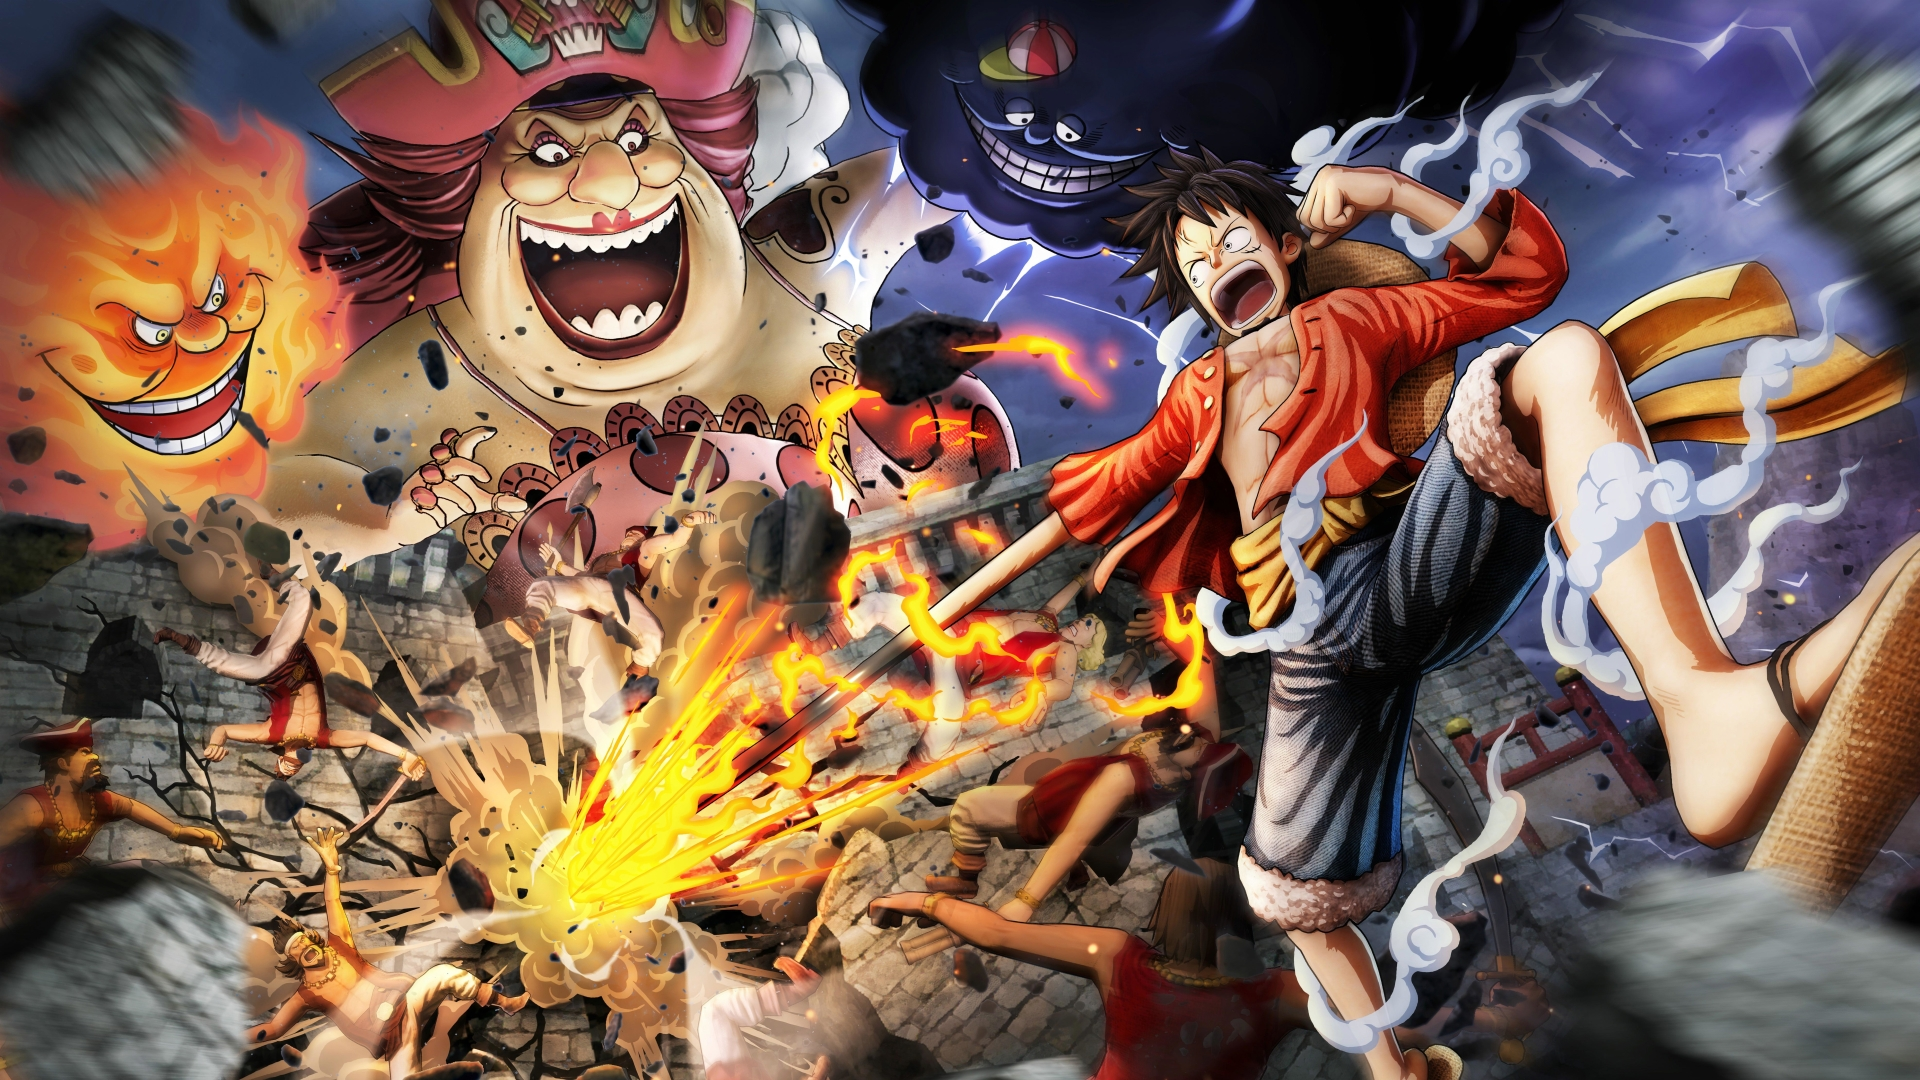 1920x1080 One Piece Pirate Warriors 1080P Laptop Full HD ...